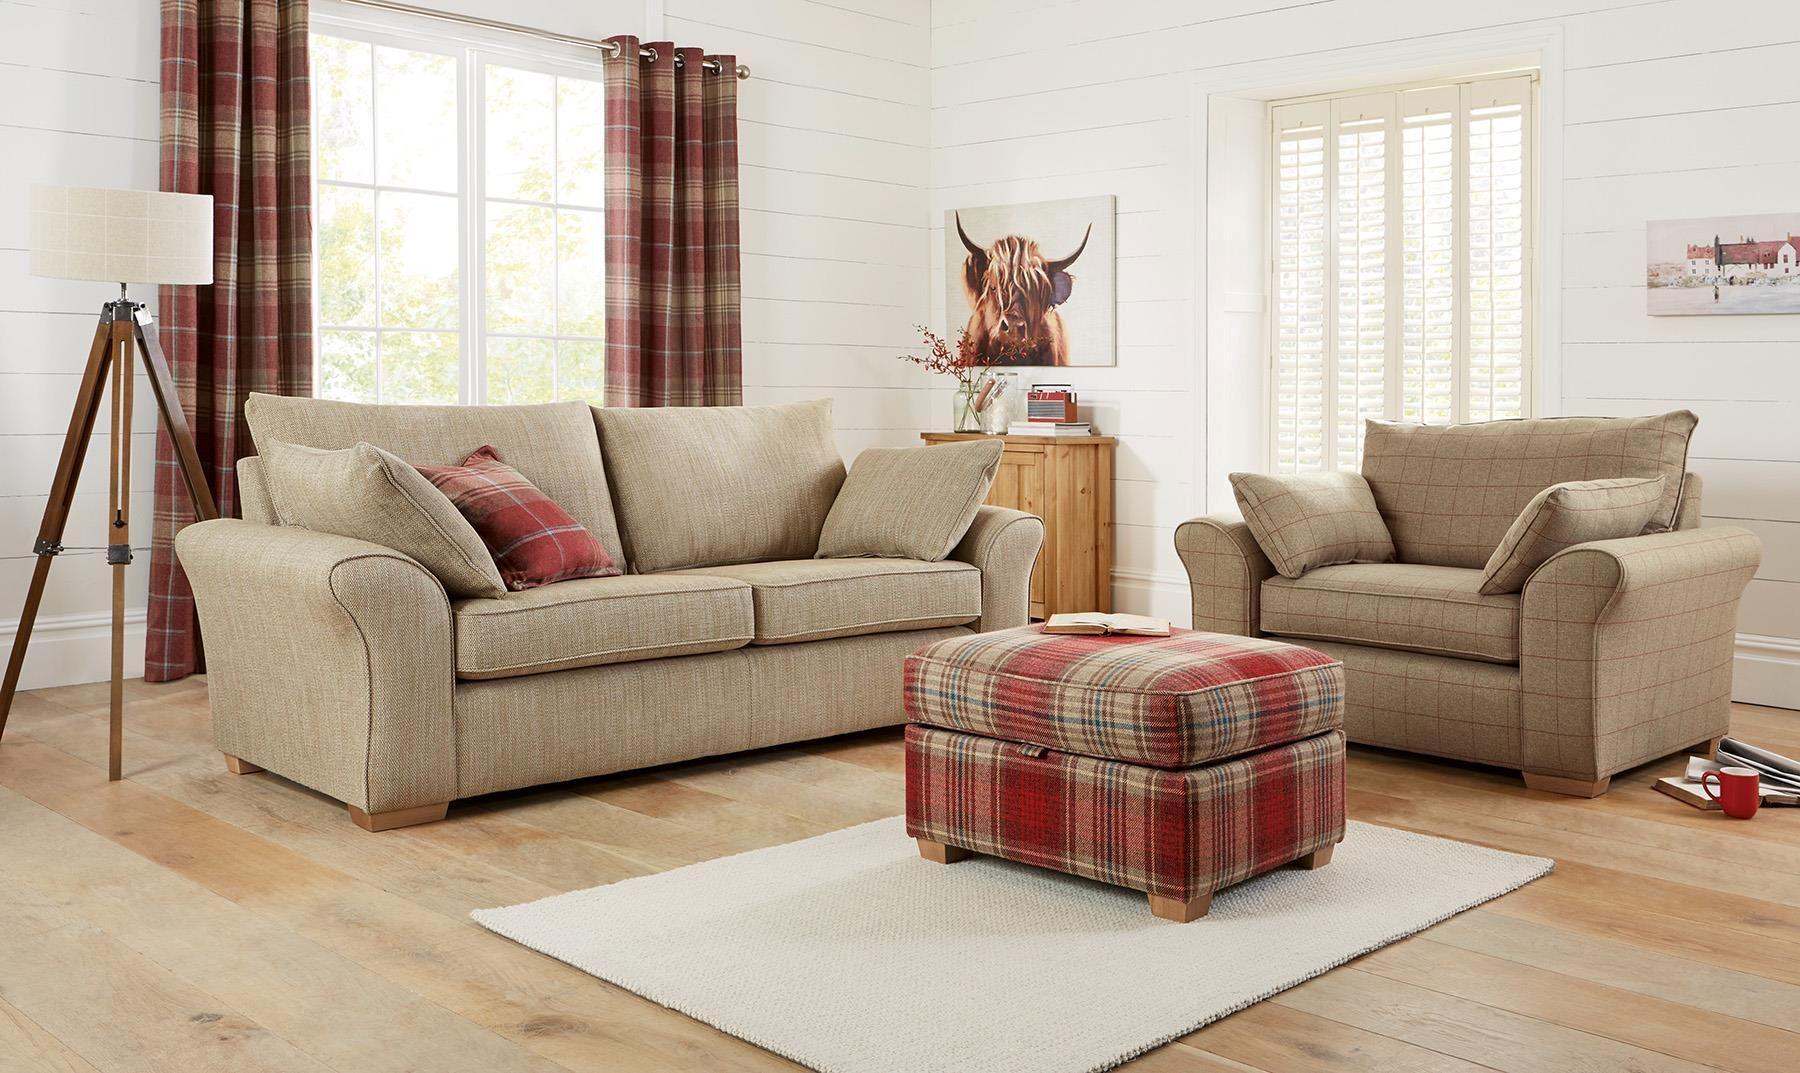 Next tartan living room   Next living room, Curtains living room